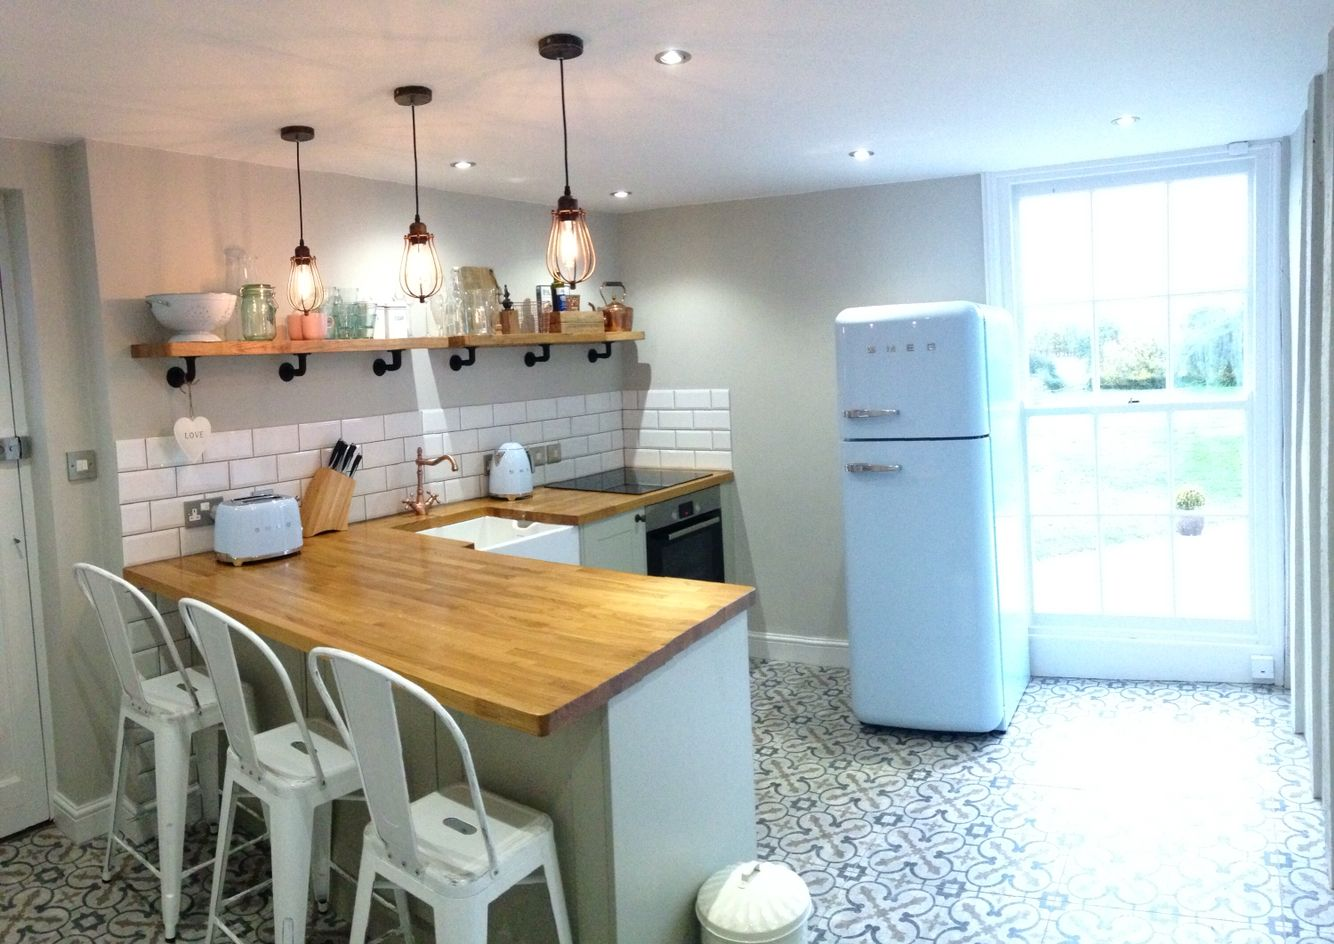 Rustic chic kitchen complete with pastel blue Smeg fridge, kettle ...